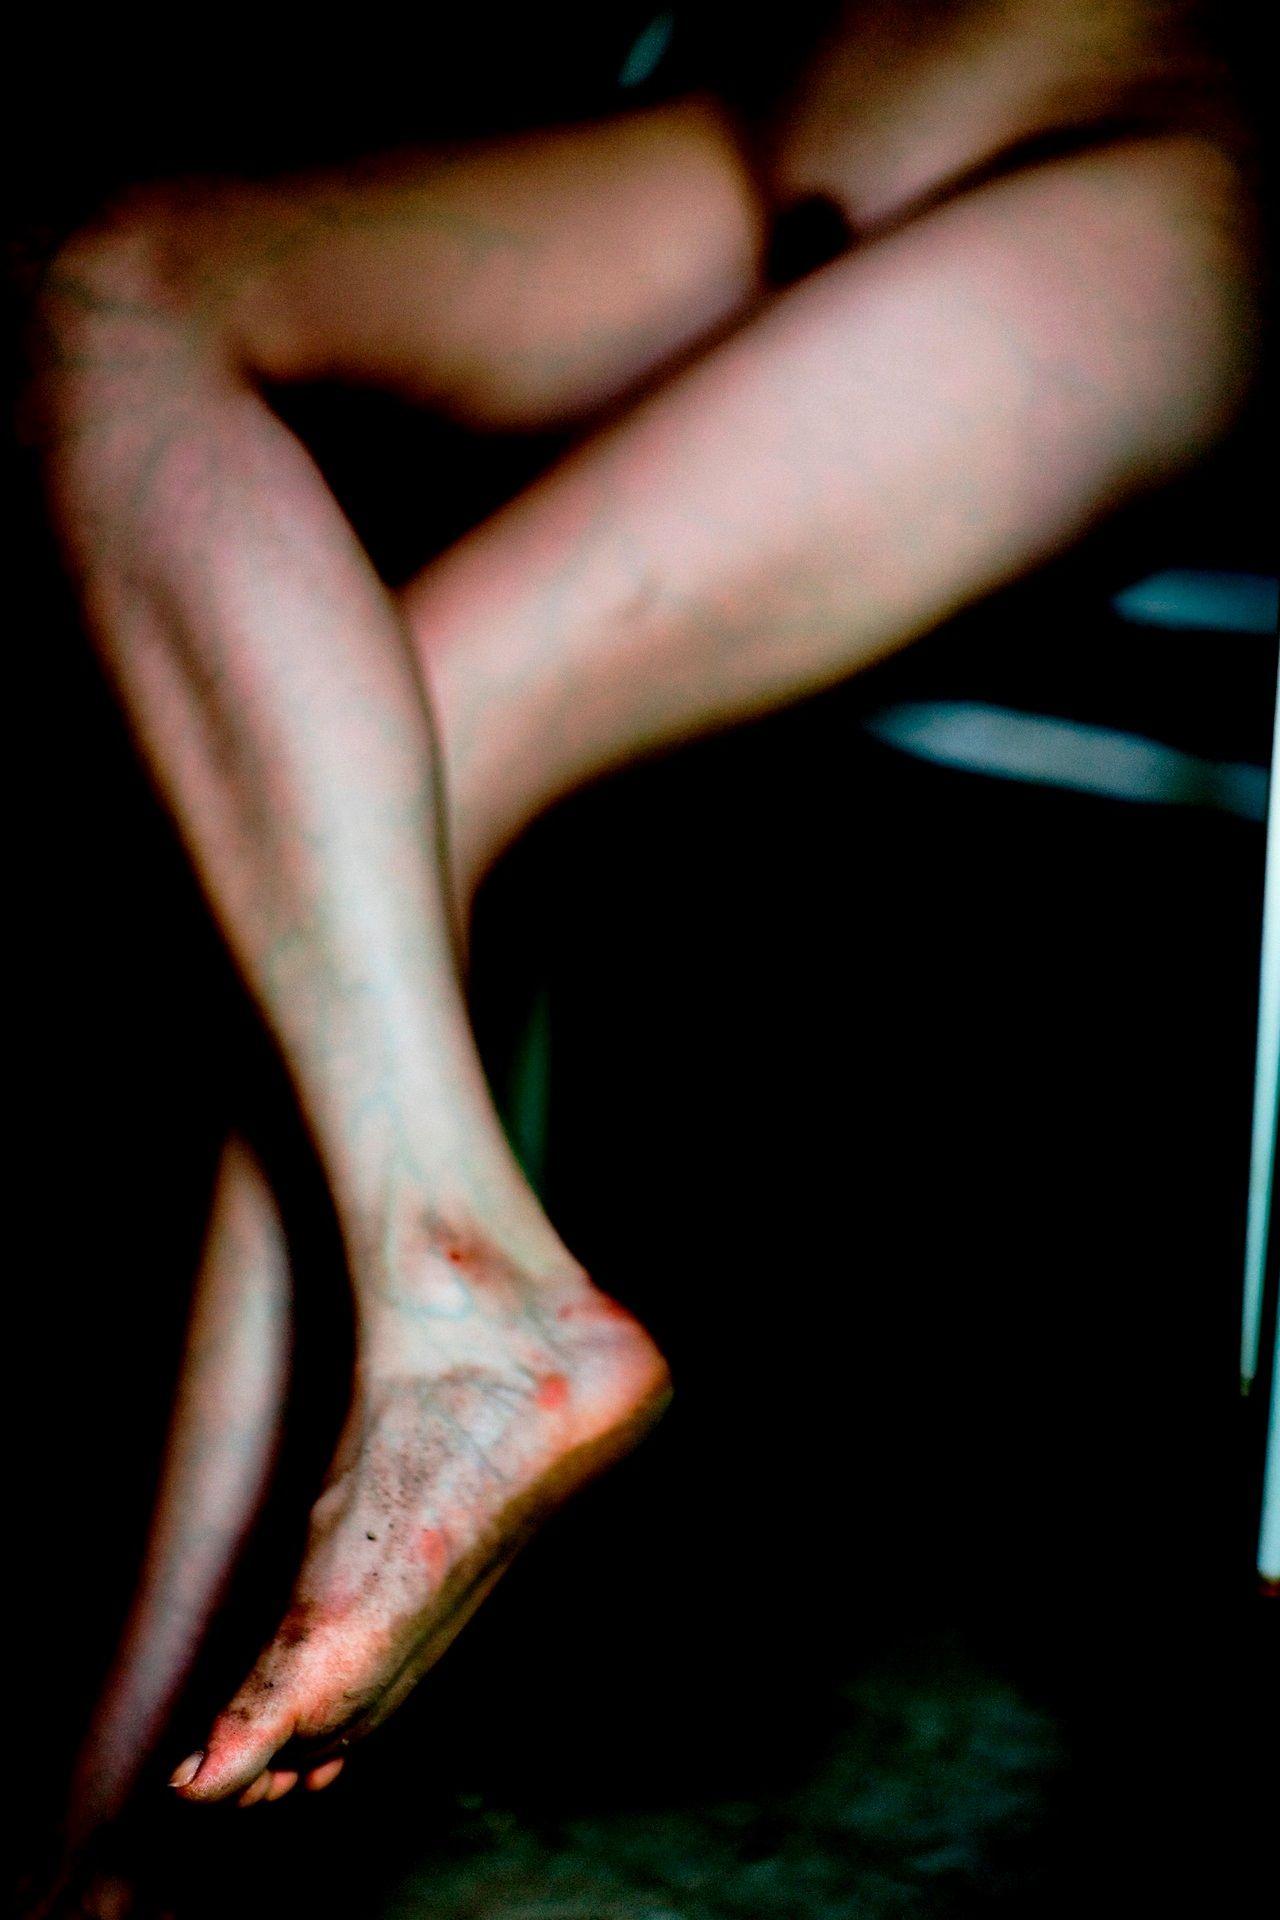 Anais pouliot by chadwick tyler hq photo shoot nudes (64 photos), Hot Celebrites fotos